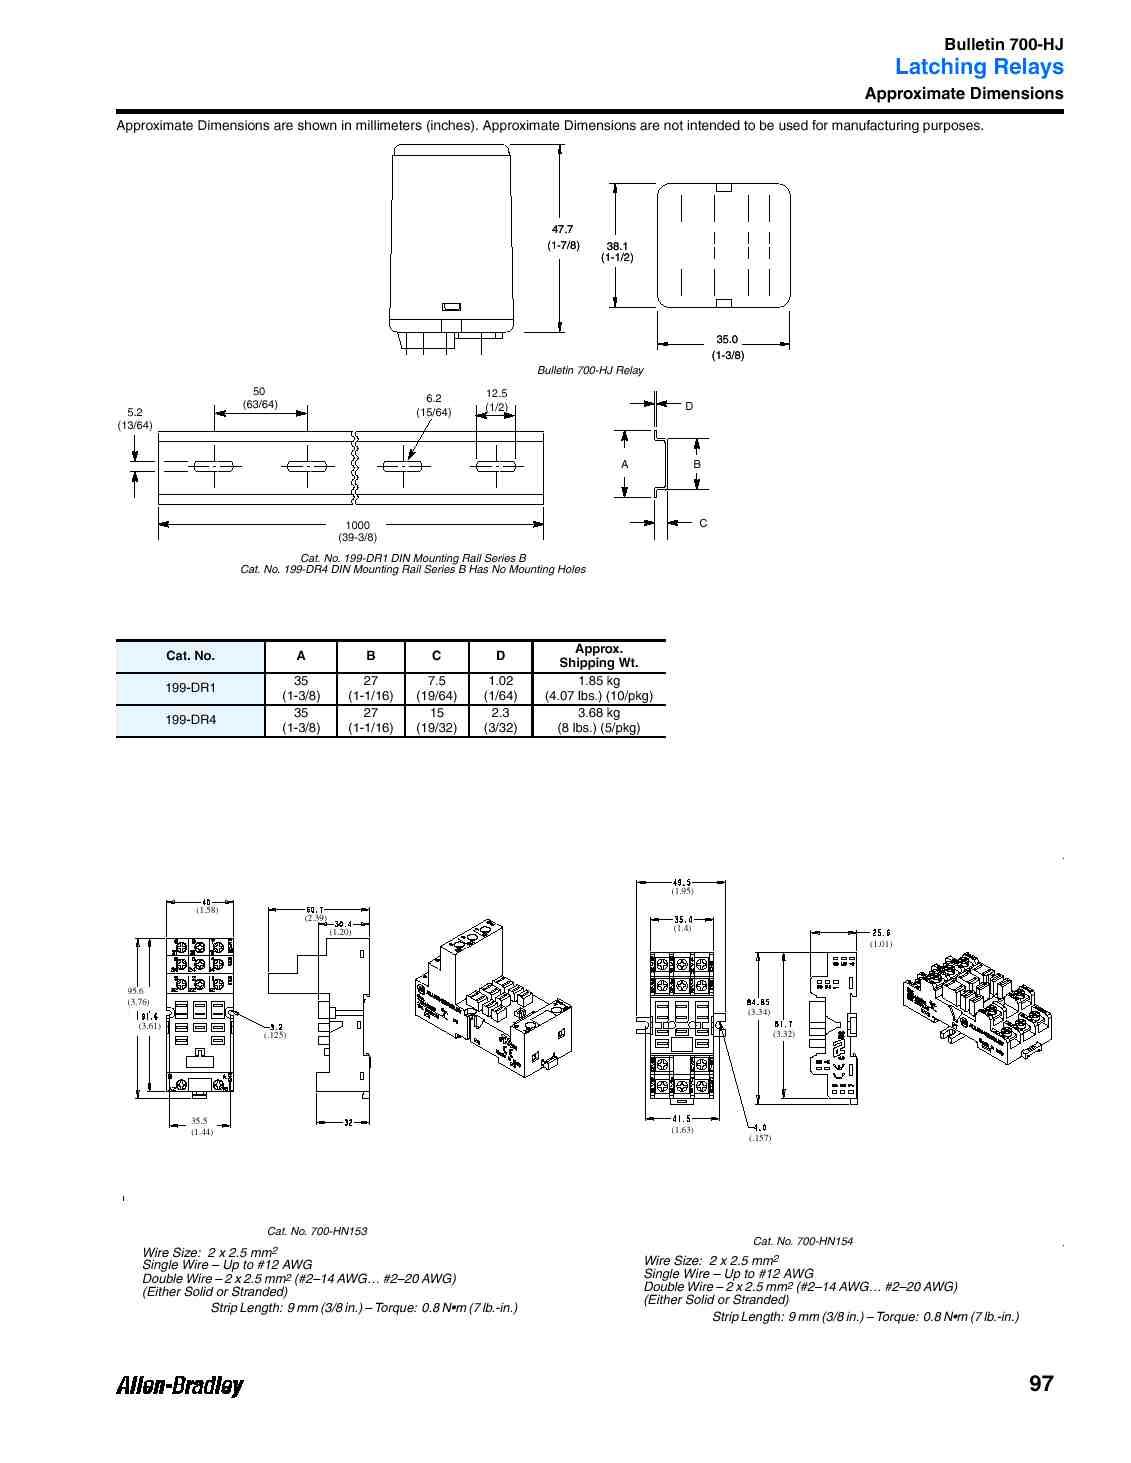 allen bradley relay wiring diagram allen bradley 700 relay wiring diagram general wiring diagram  allen bradley 700 relay wiring diagram